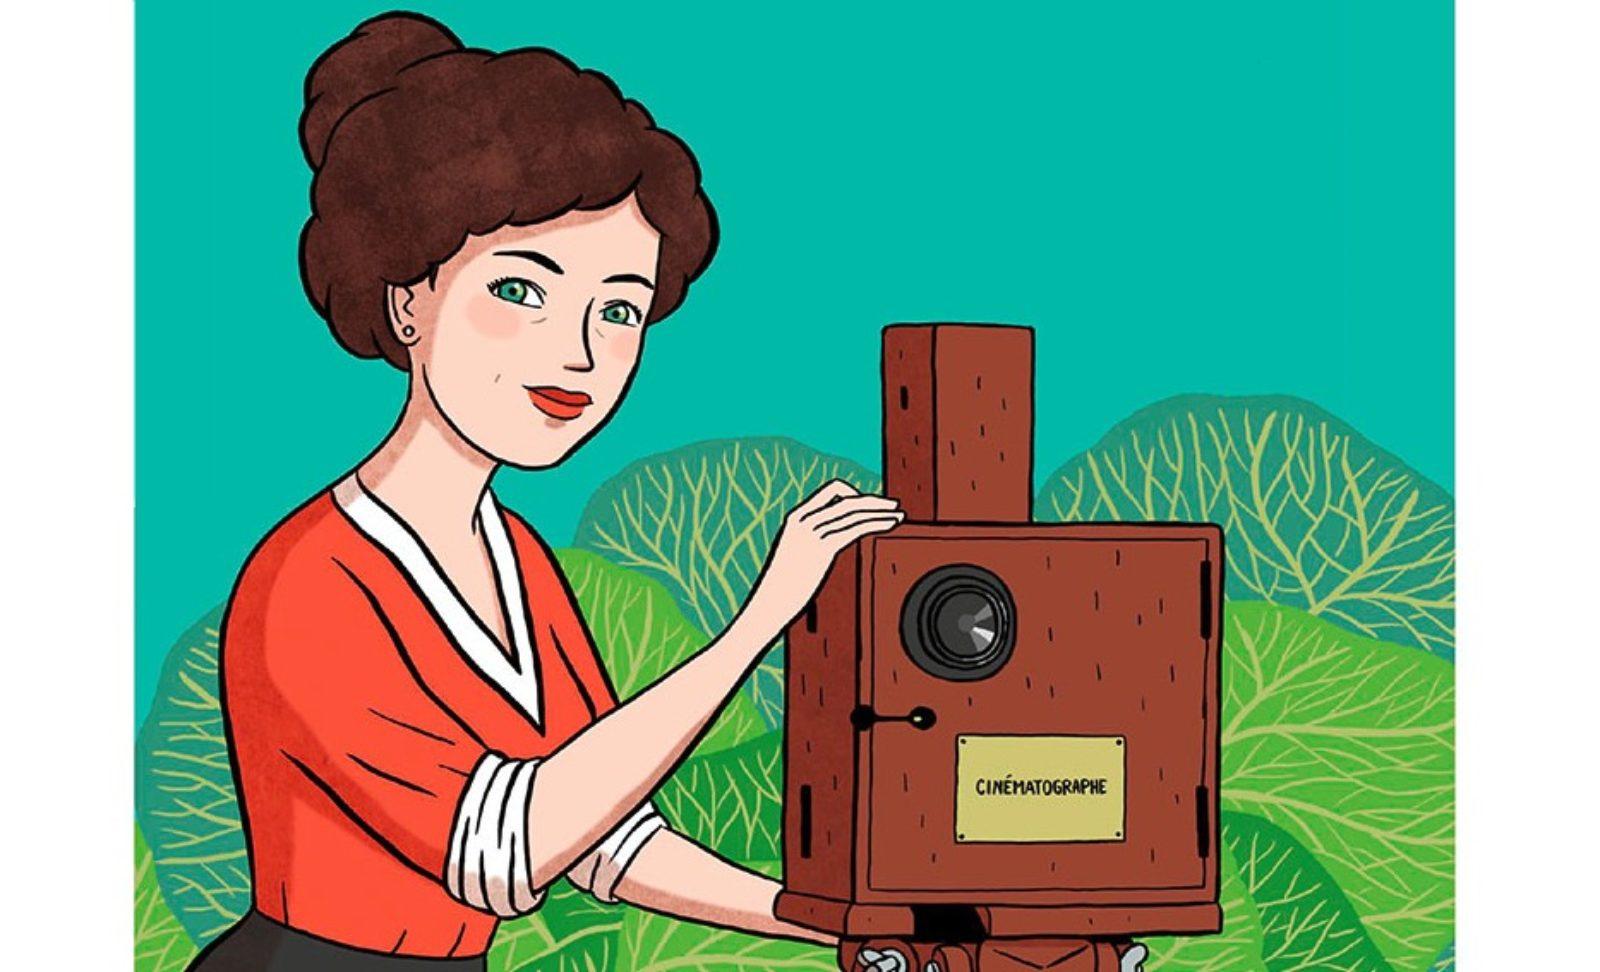 Femme inspirante : Mademoiselle Alice qui inventa le cinéma